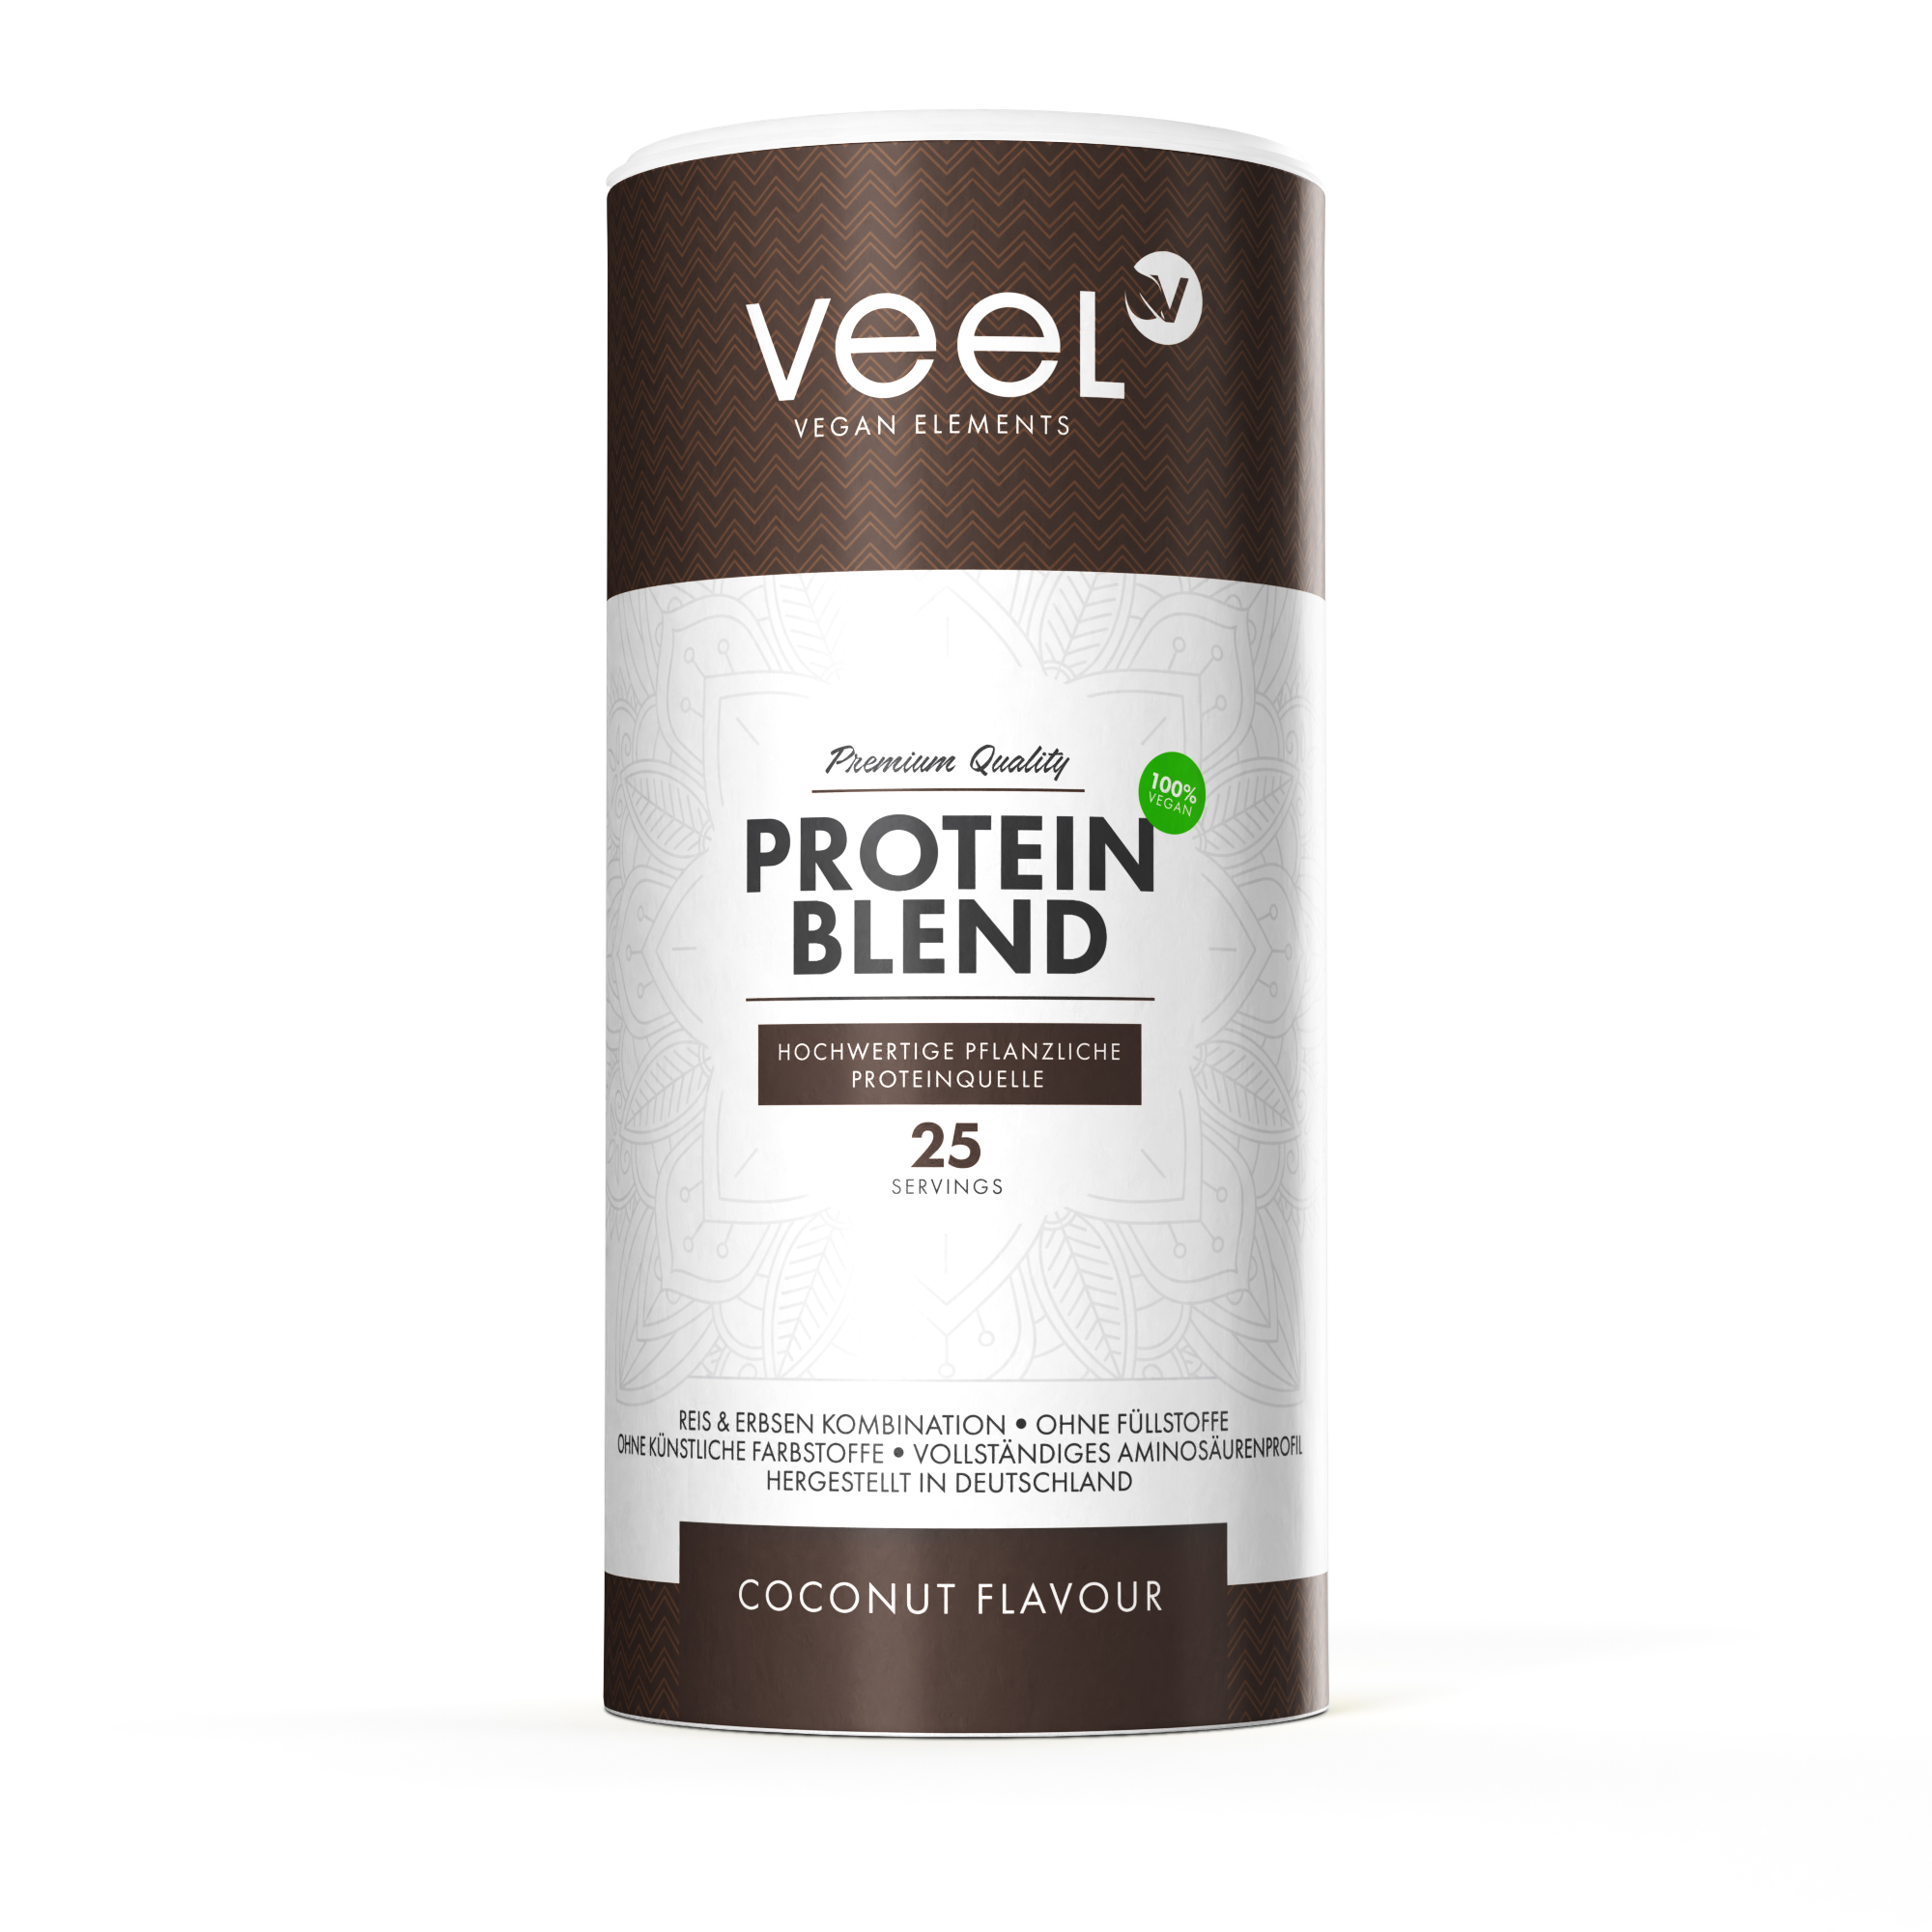 VEEL Protein Blend 750g/Coconut